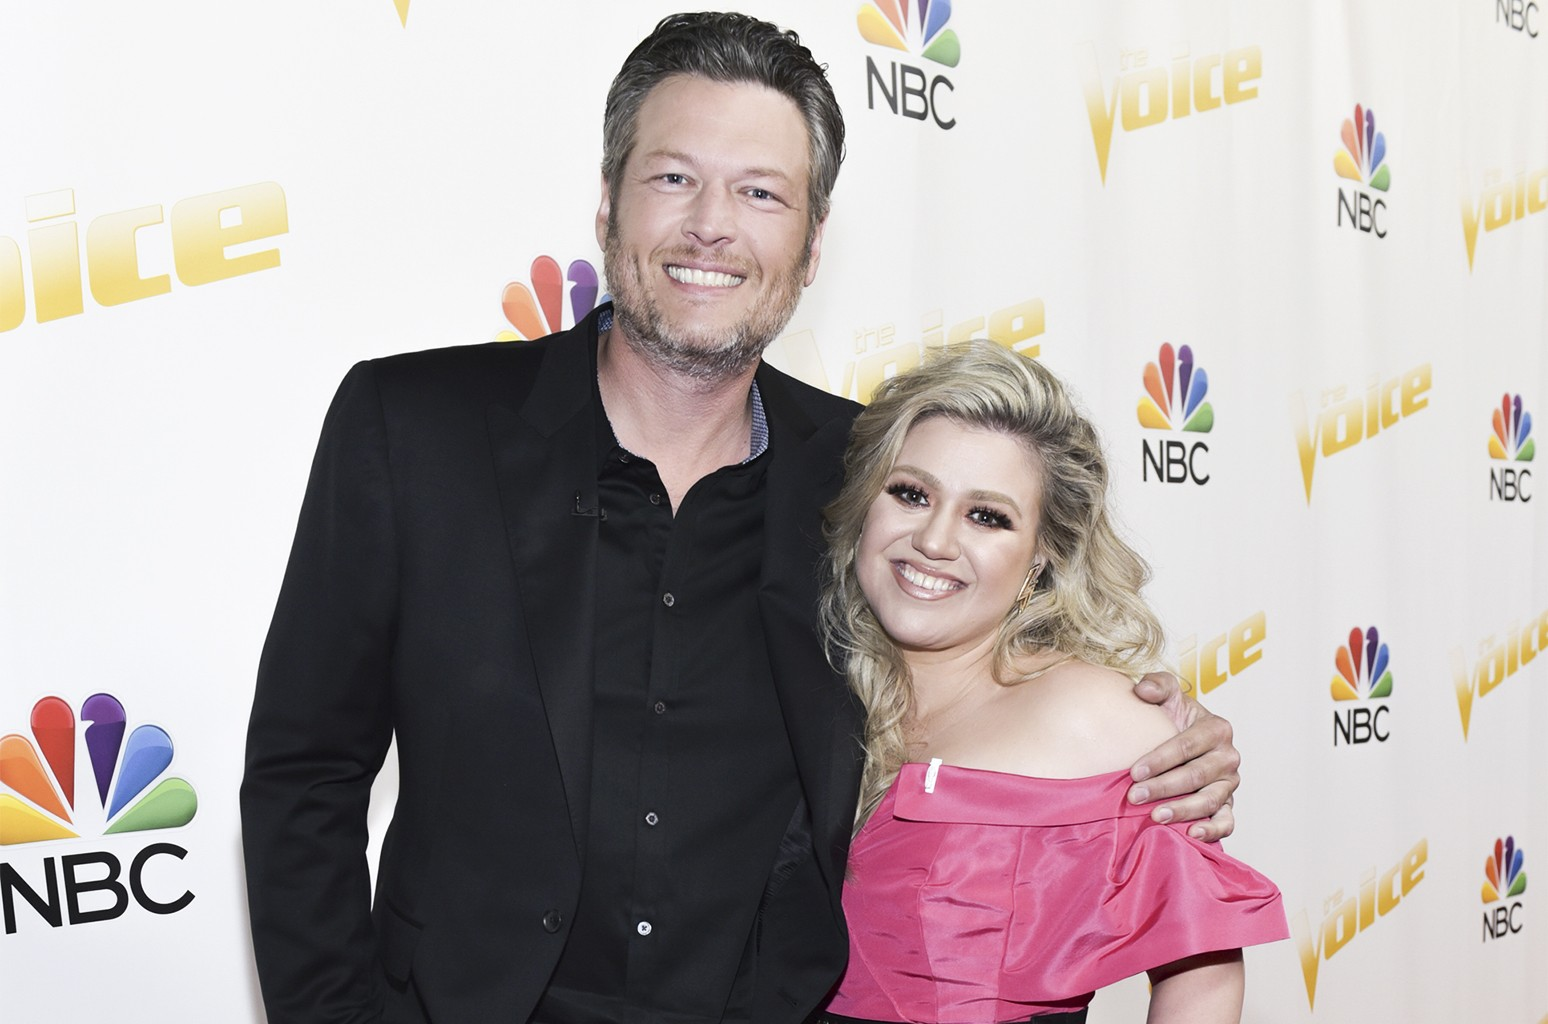 Blake Shelton and Kelly Clarkson